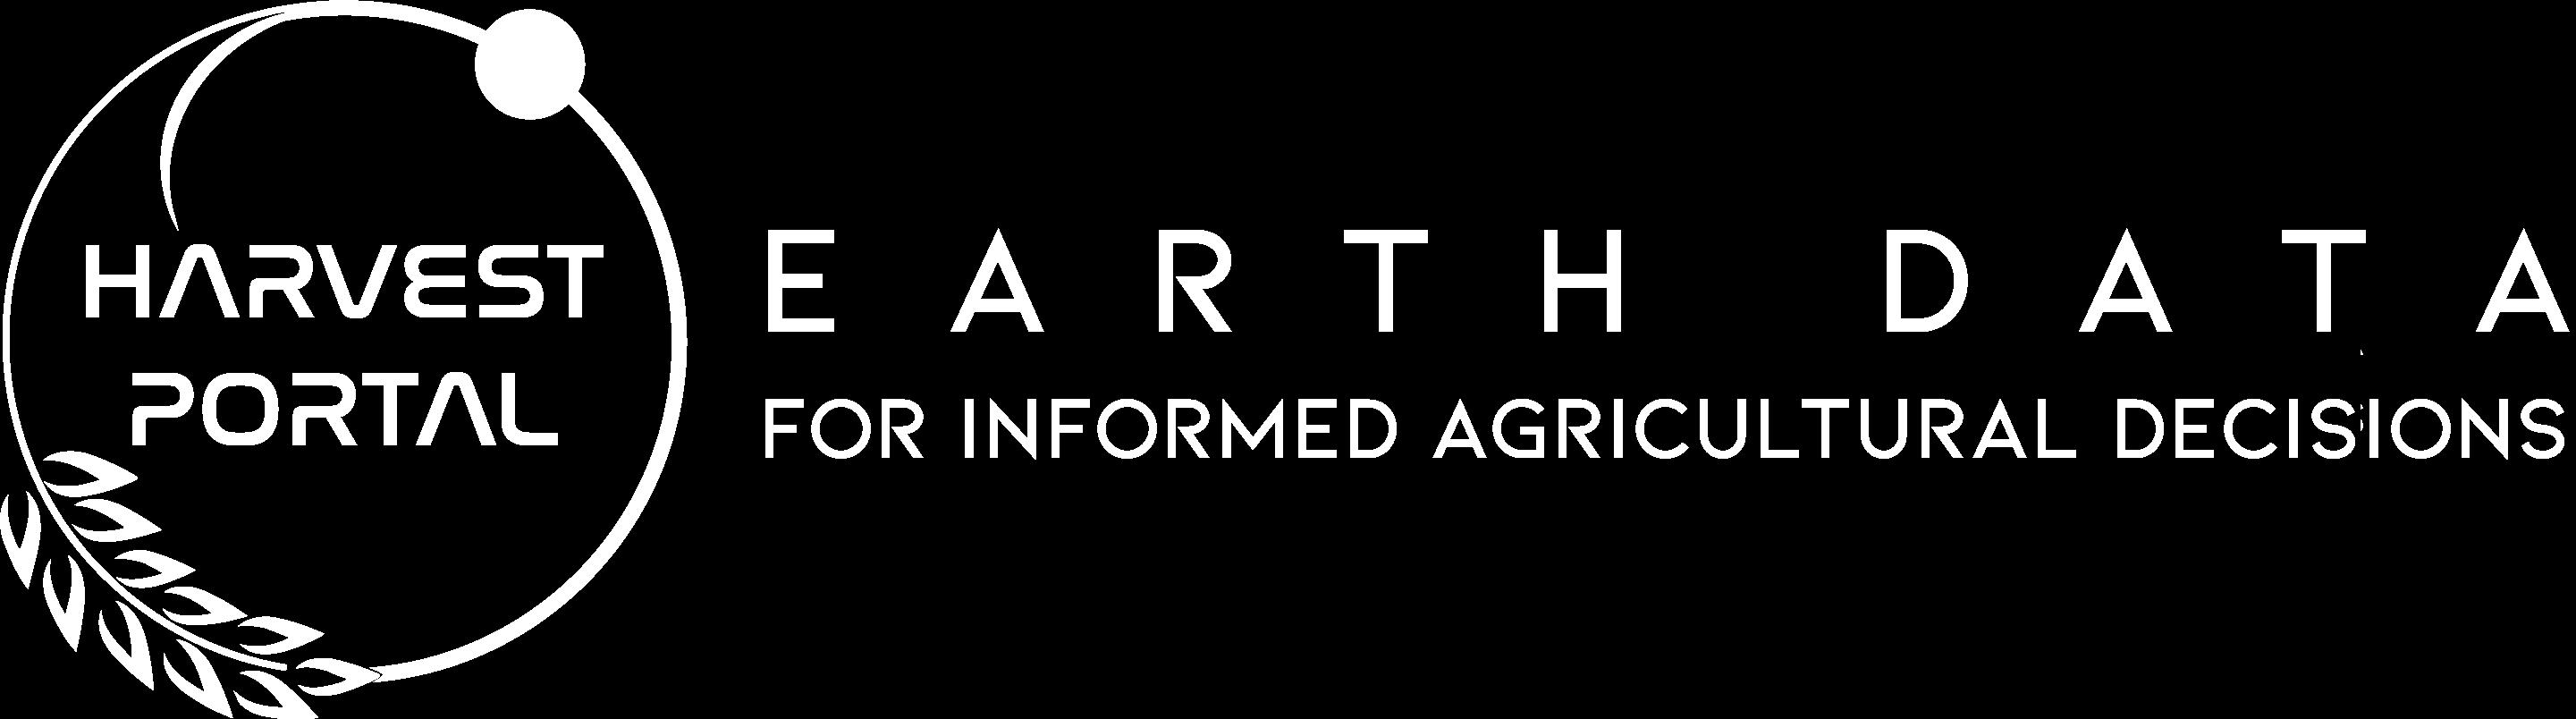 NASA Harvest Portal